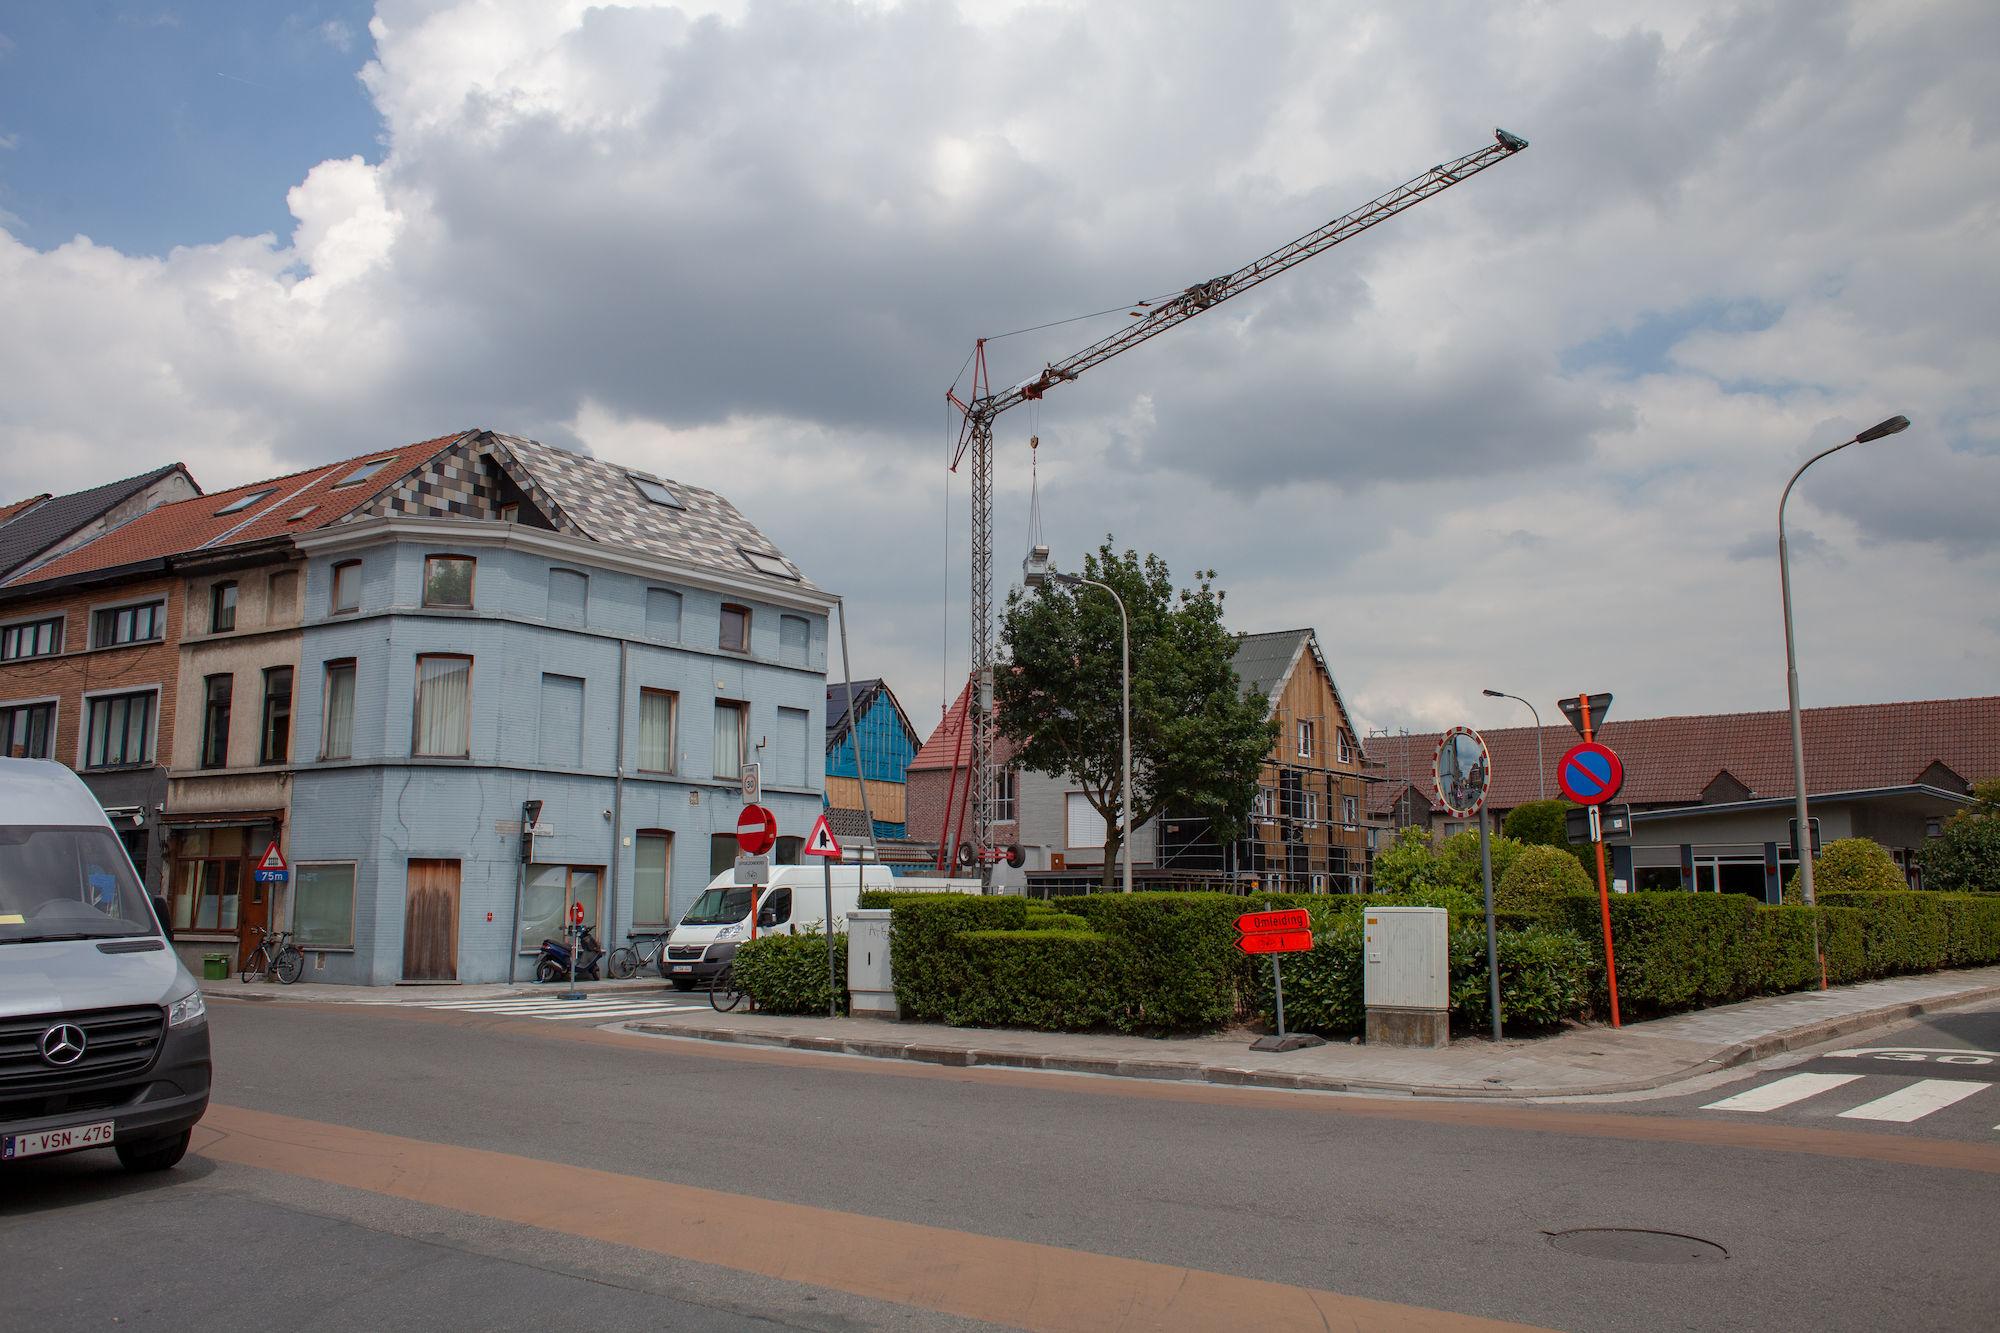 2019-07-02 Muide Meulestede prospectie Wannes_stadsvernieuwing_IMG_0434-3.jpg